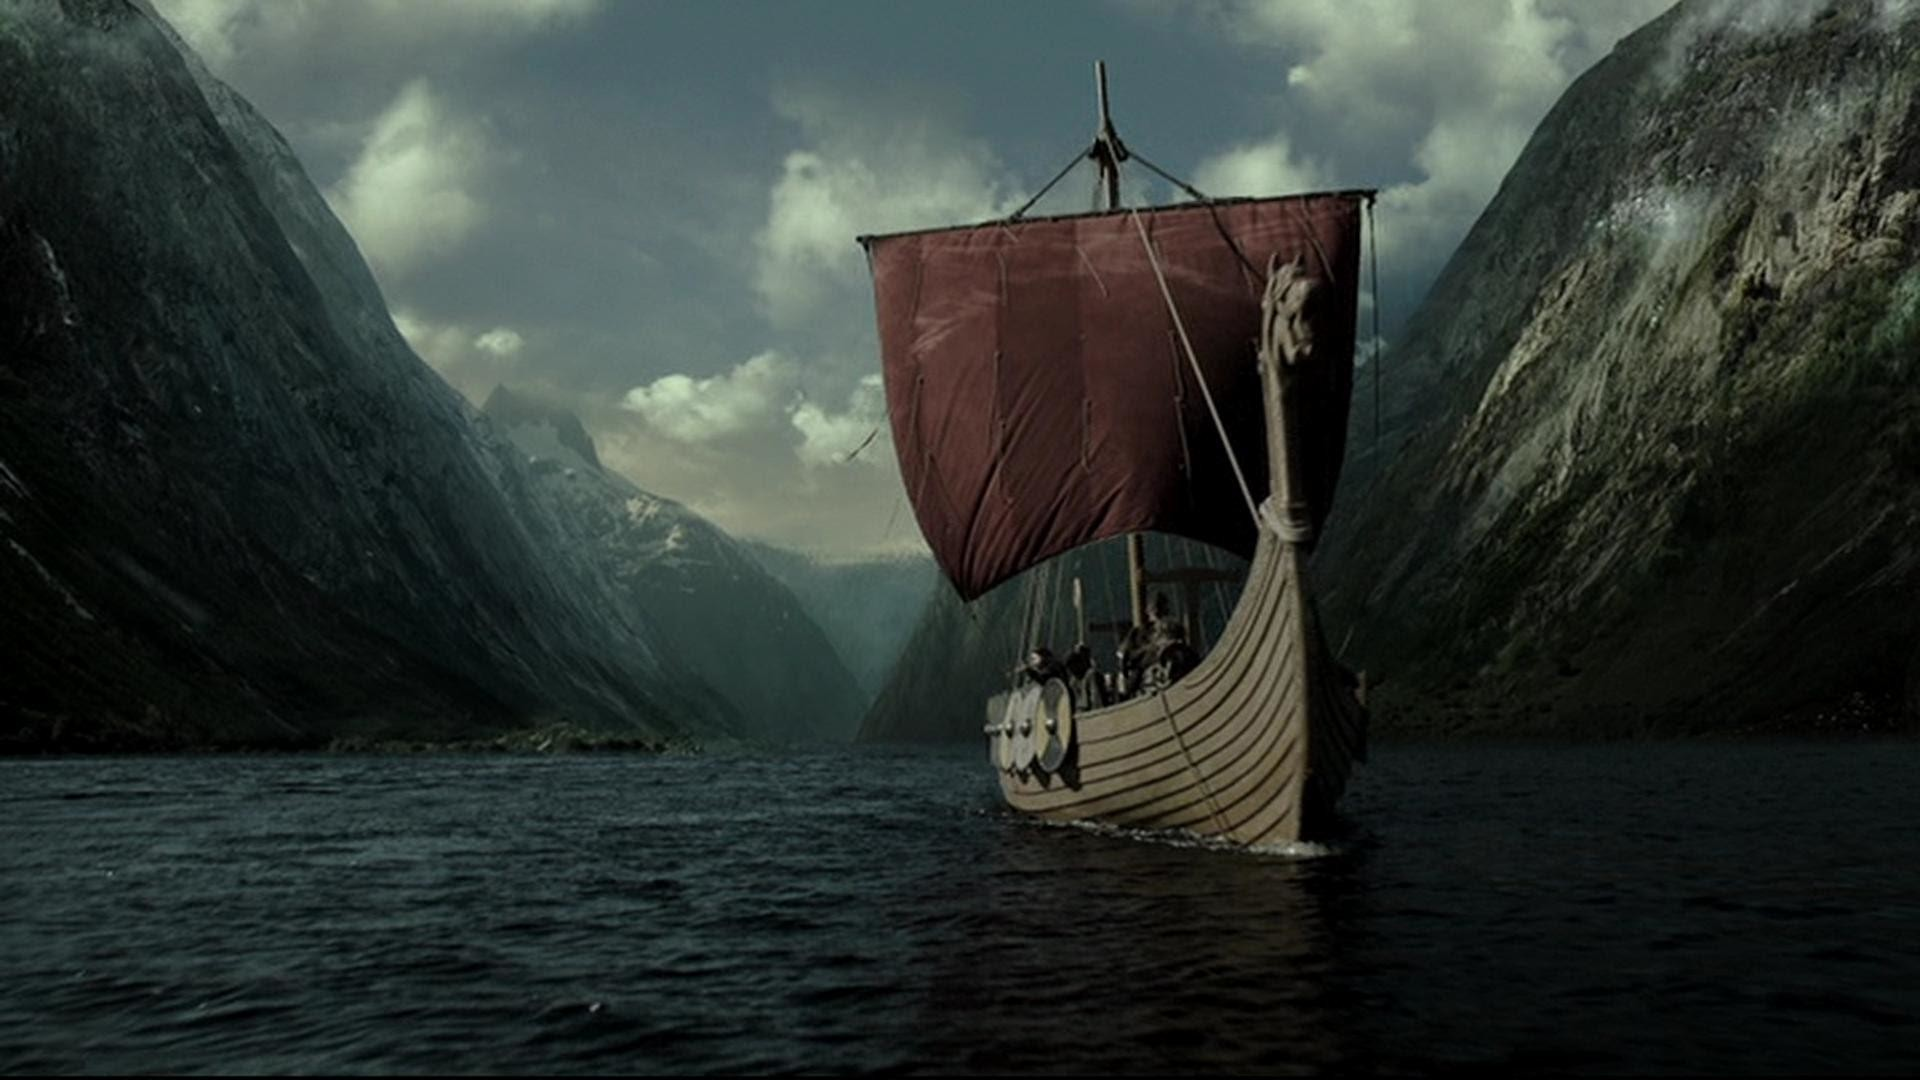 wallpaper.wiki-Free-HD-Vikings-Background-PIC-WPE00345